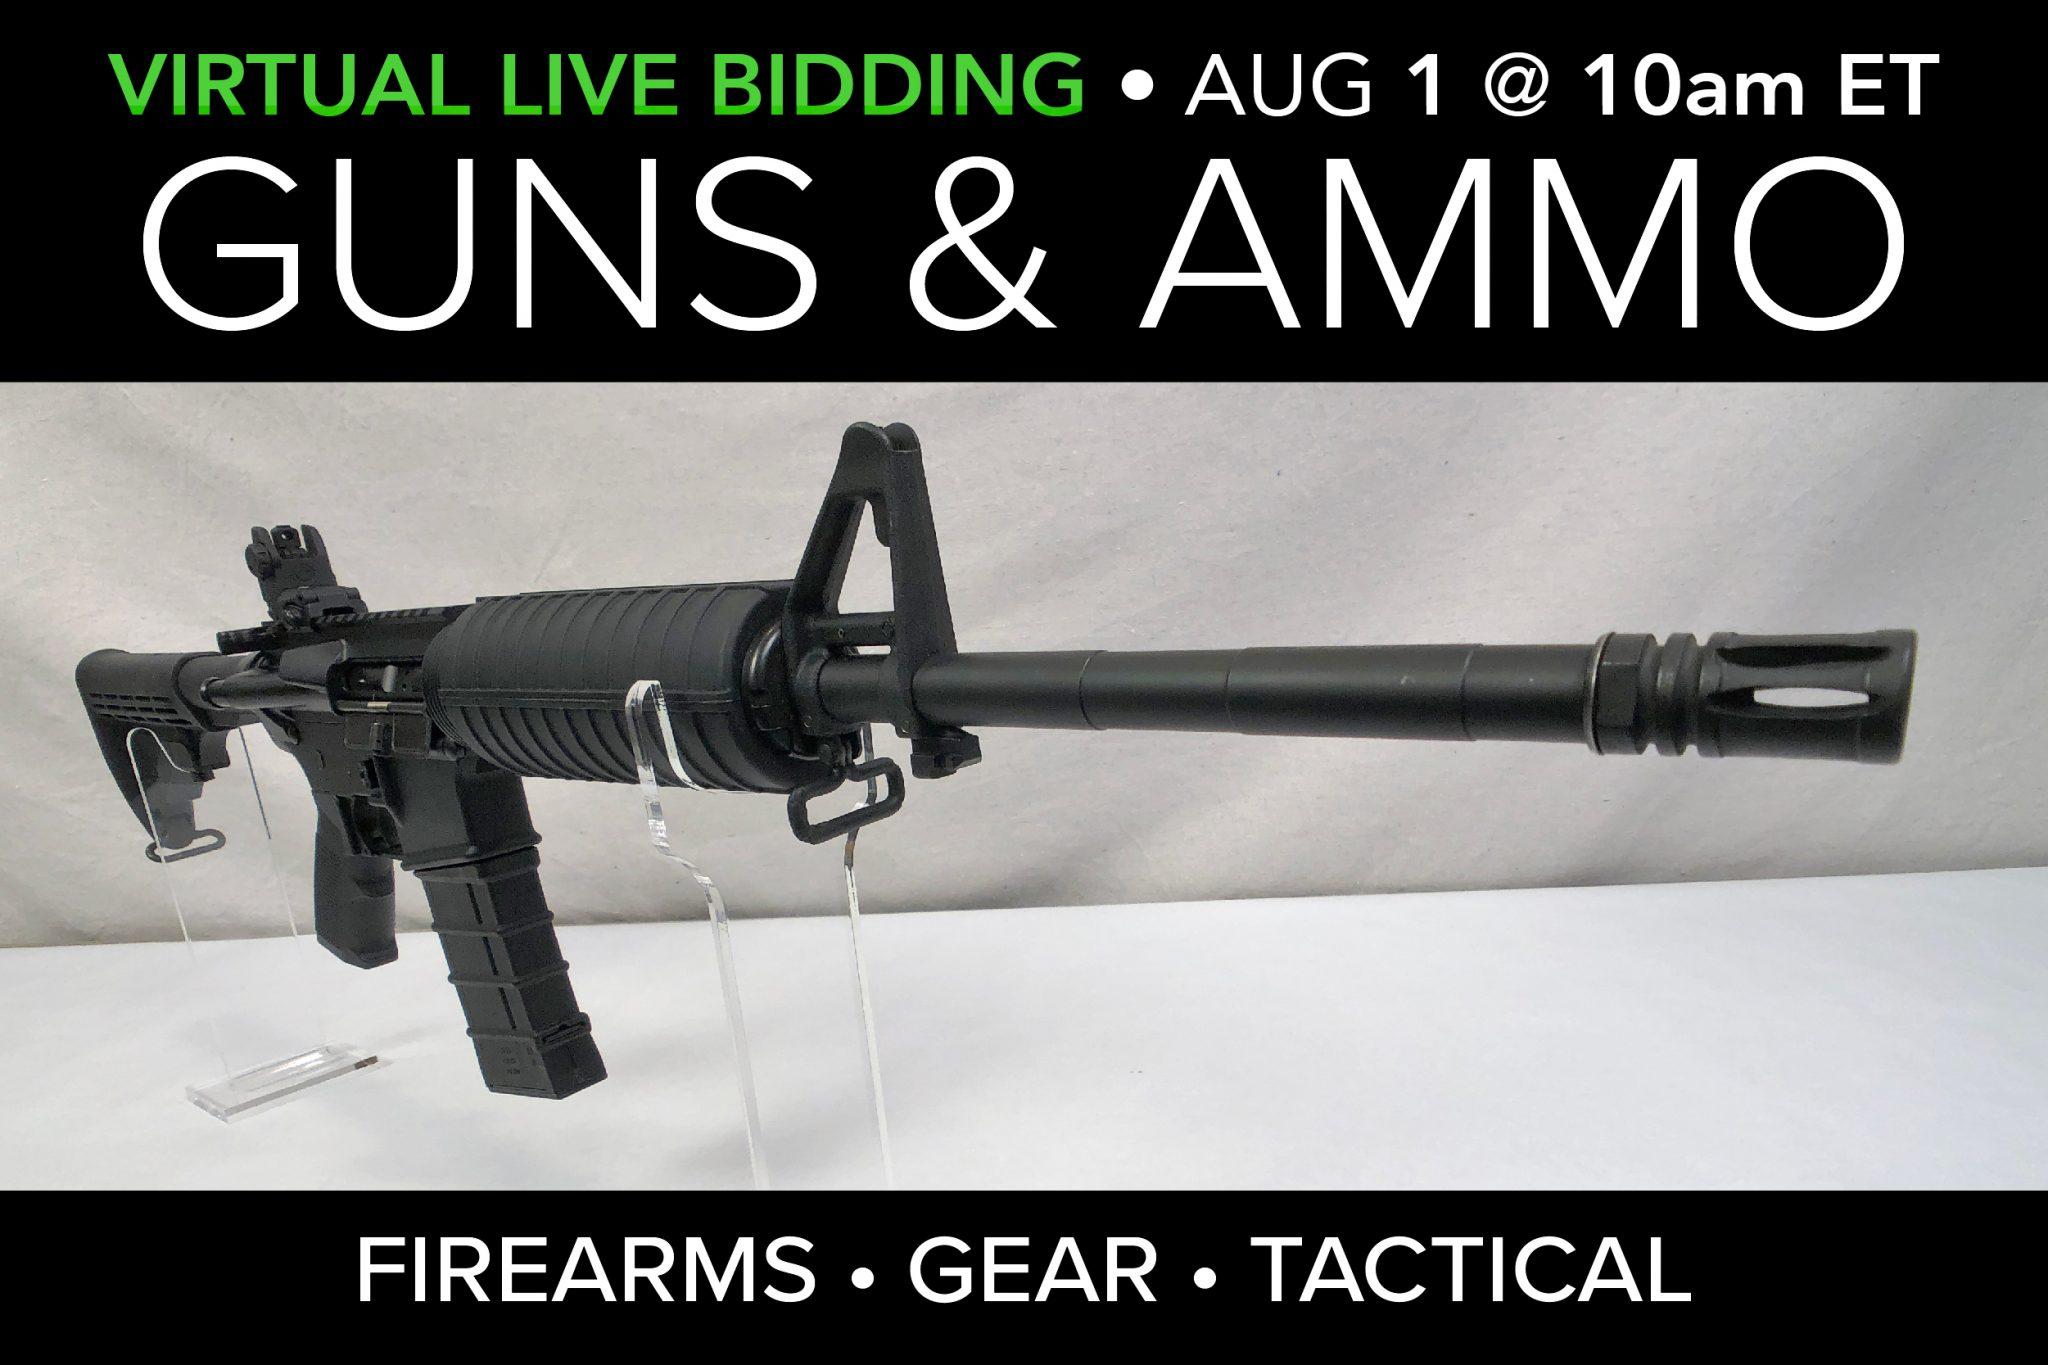 August 2020 Guns Ammo Gear public auction